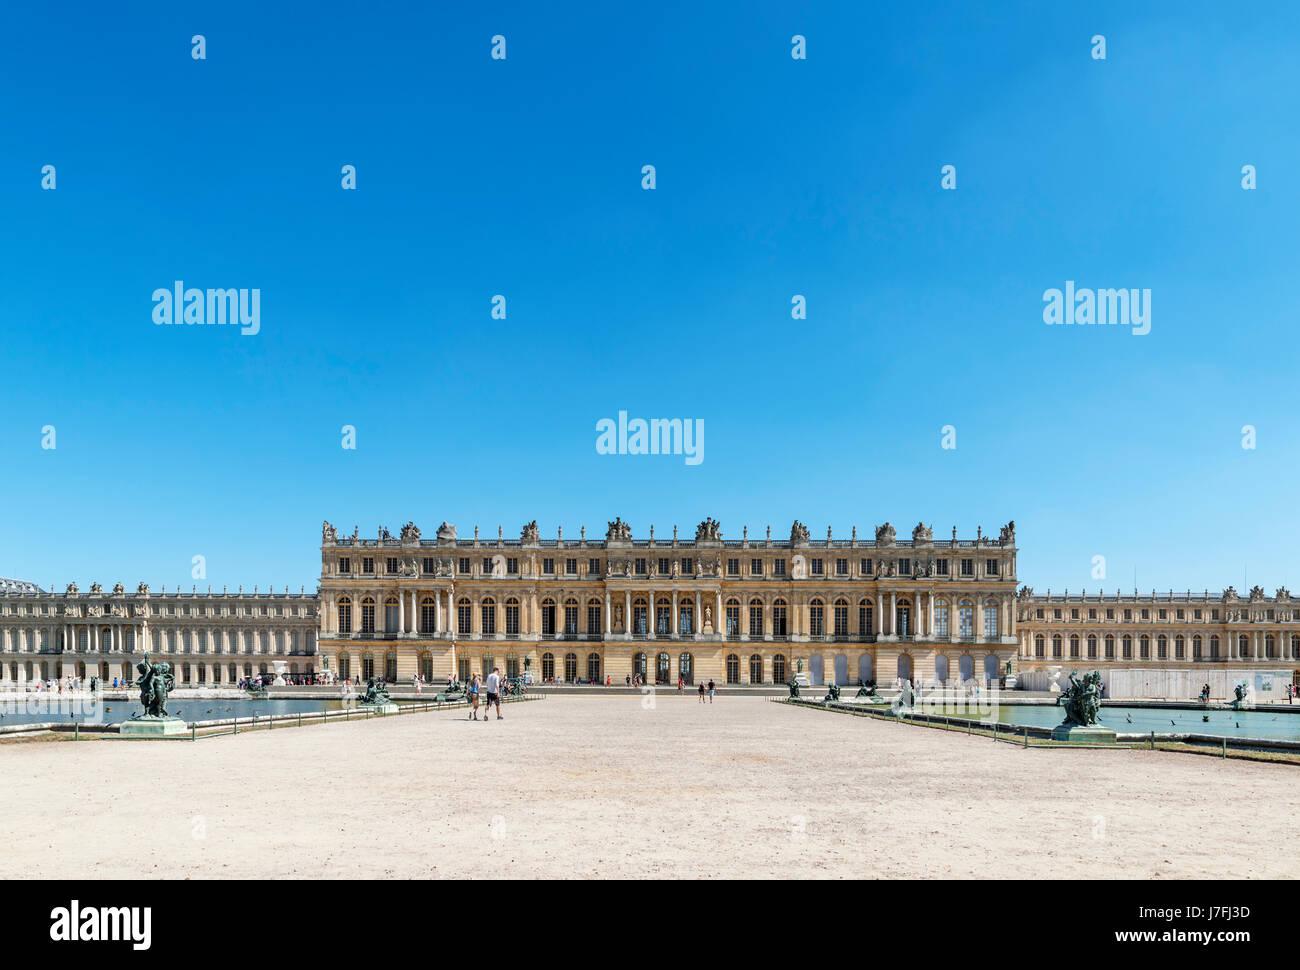 Rear view of the Chateau de Versailles (Palace of Versailles), near Paris, France - Stock Image